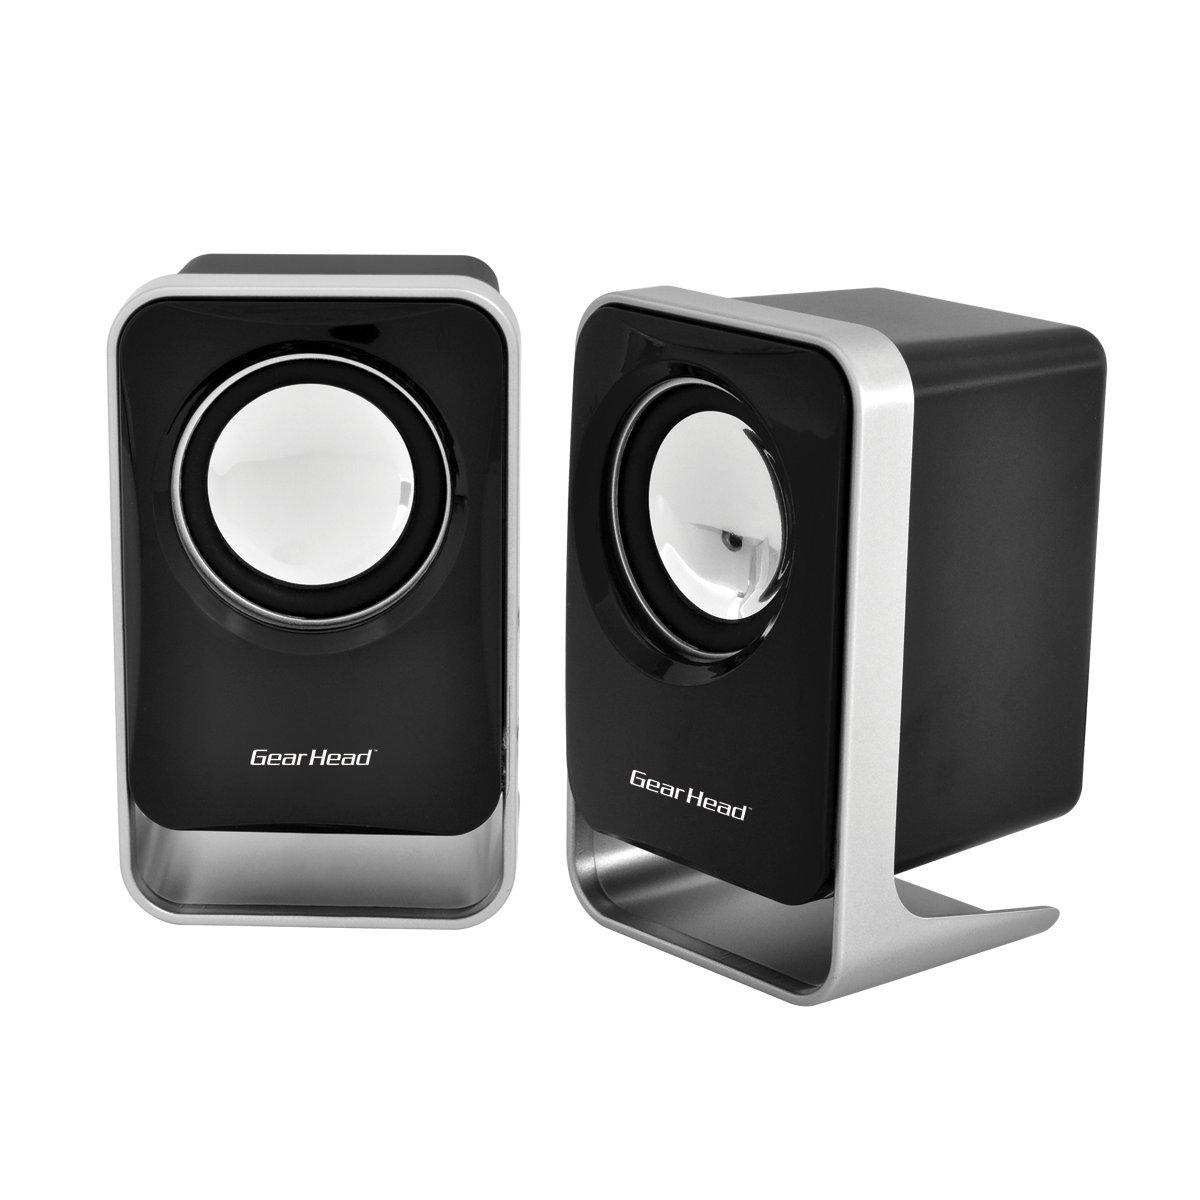 Amazoncom Gear Head USB 20 Speakers for HomeOffice SP1500USB